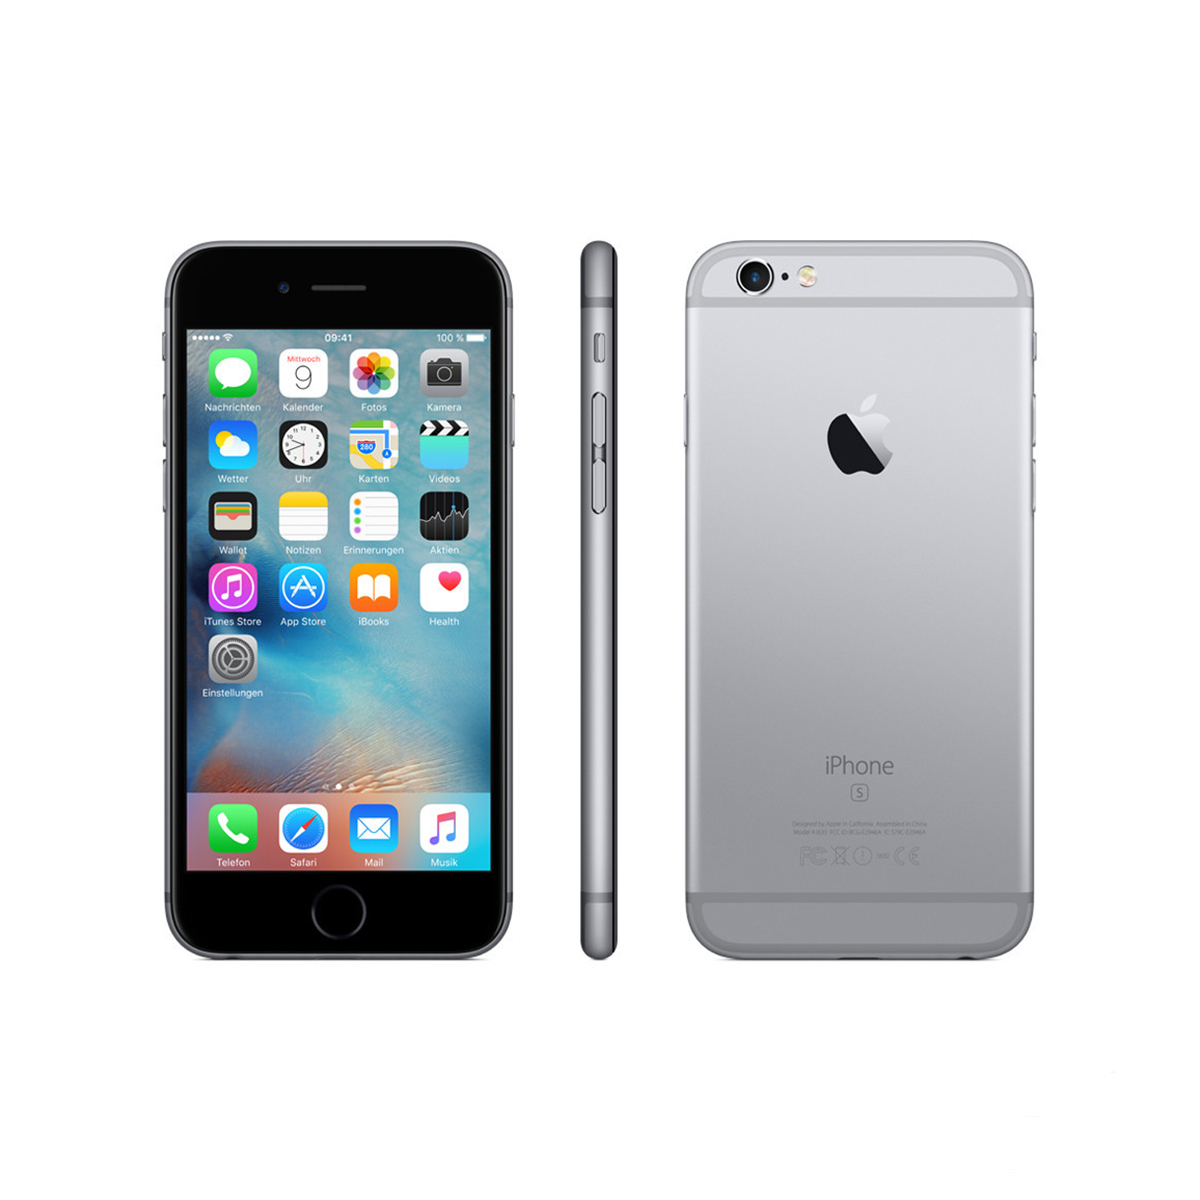 Apple iPhone 6s 64GB spacegrau gebraucht kaufen | 2tec-shop.de